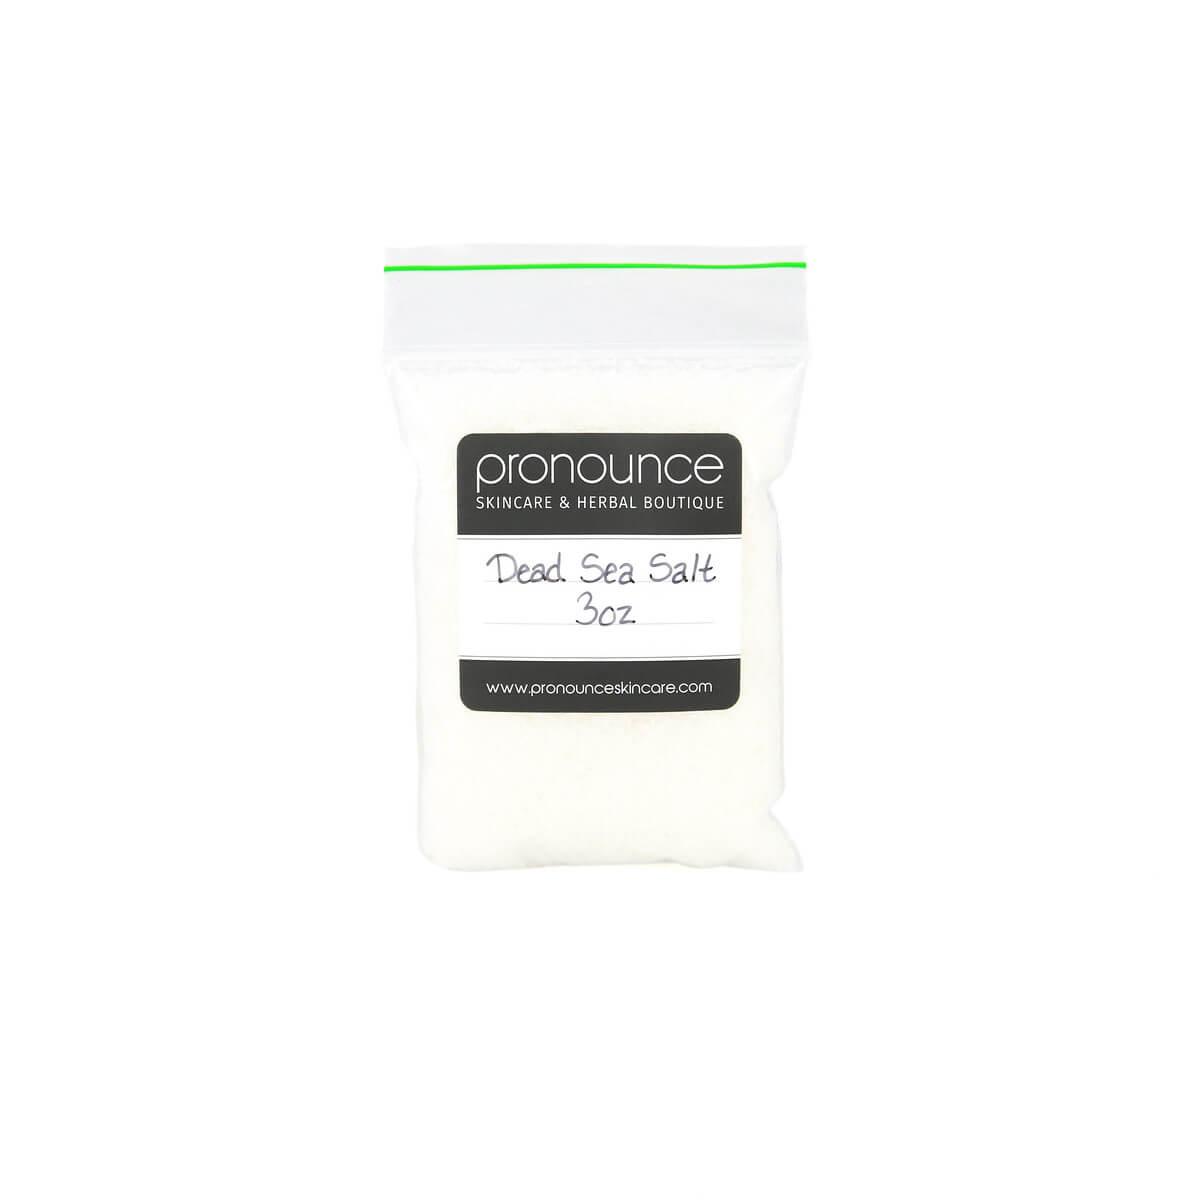 Dead Sea Salt 3oz Pronounce Skincare & Herbal Boutique